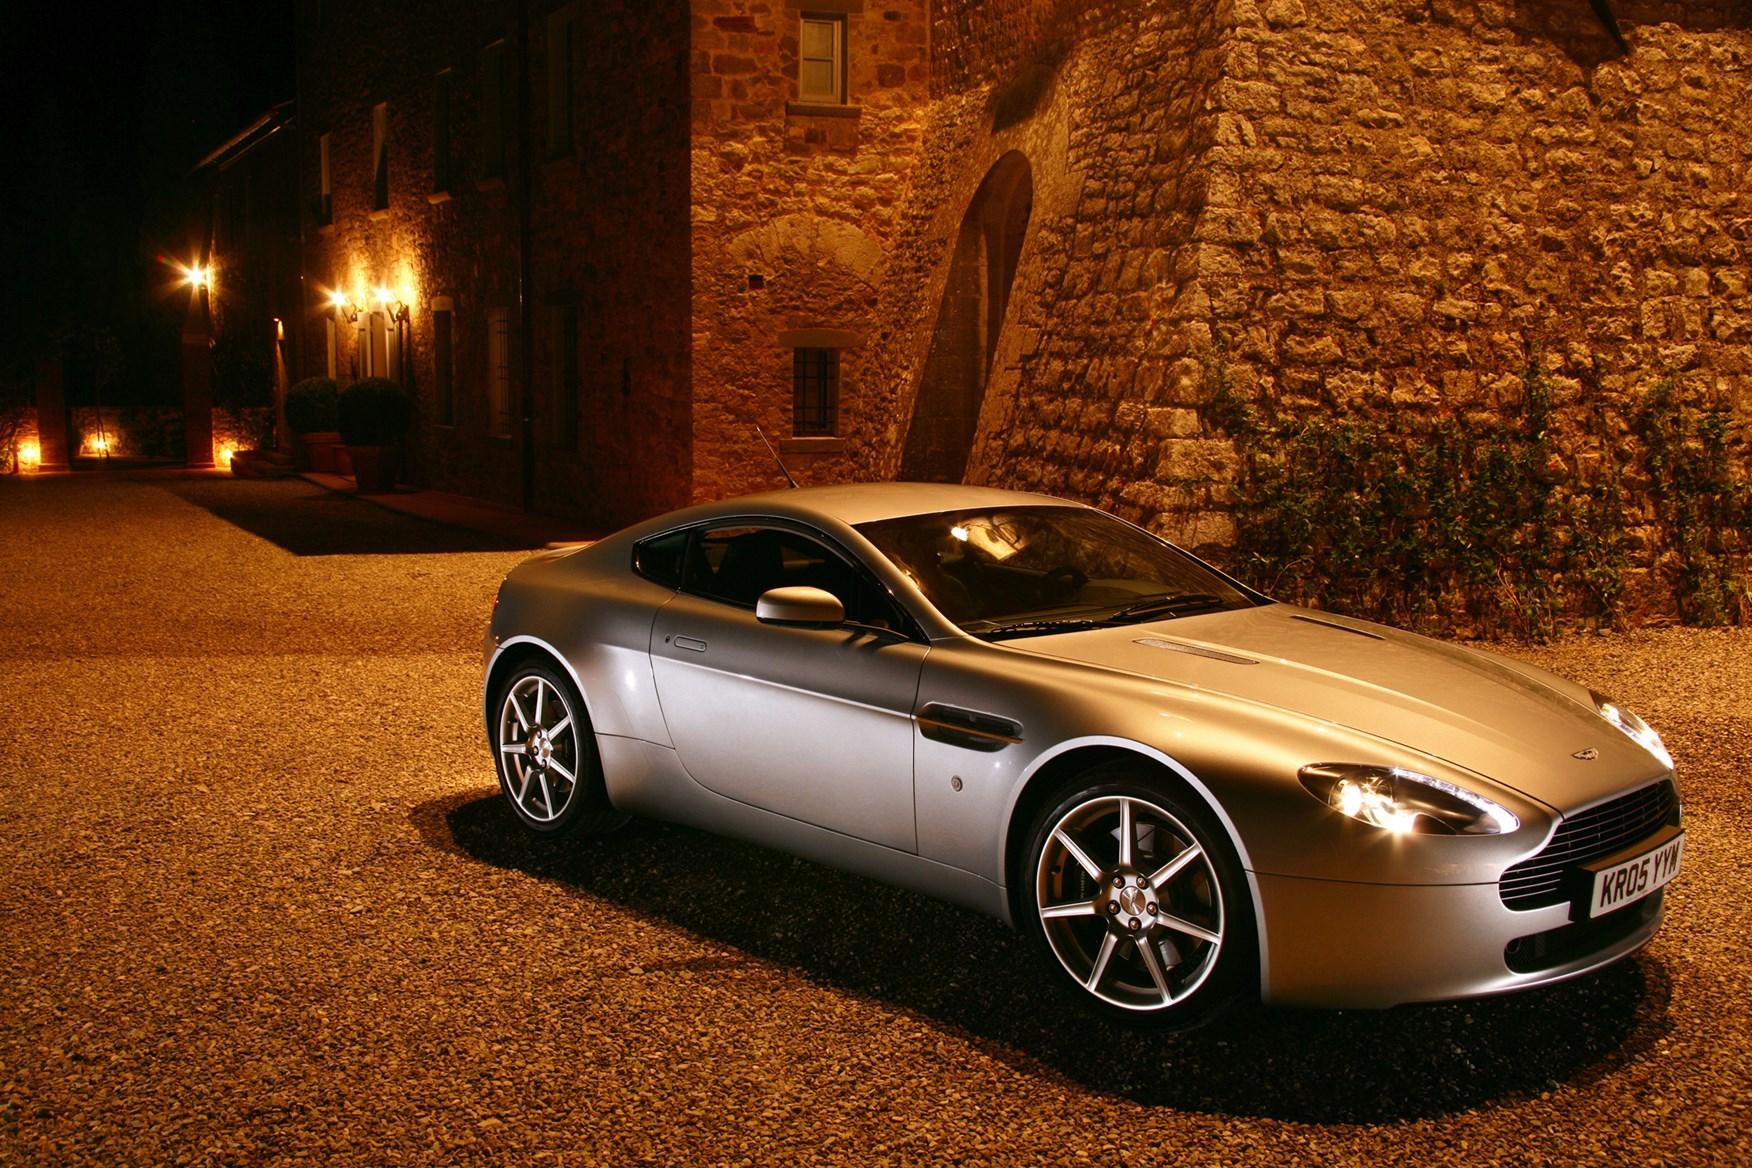 aston martin vantage coupe review 2005 parkers. Black Bedroom Furniture Sets. Home Design Ideas